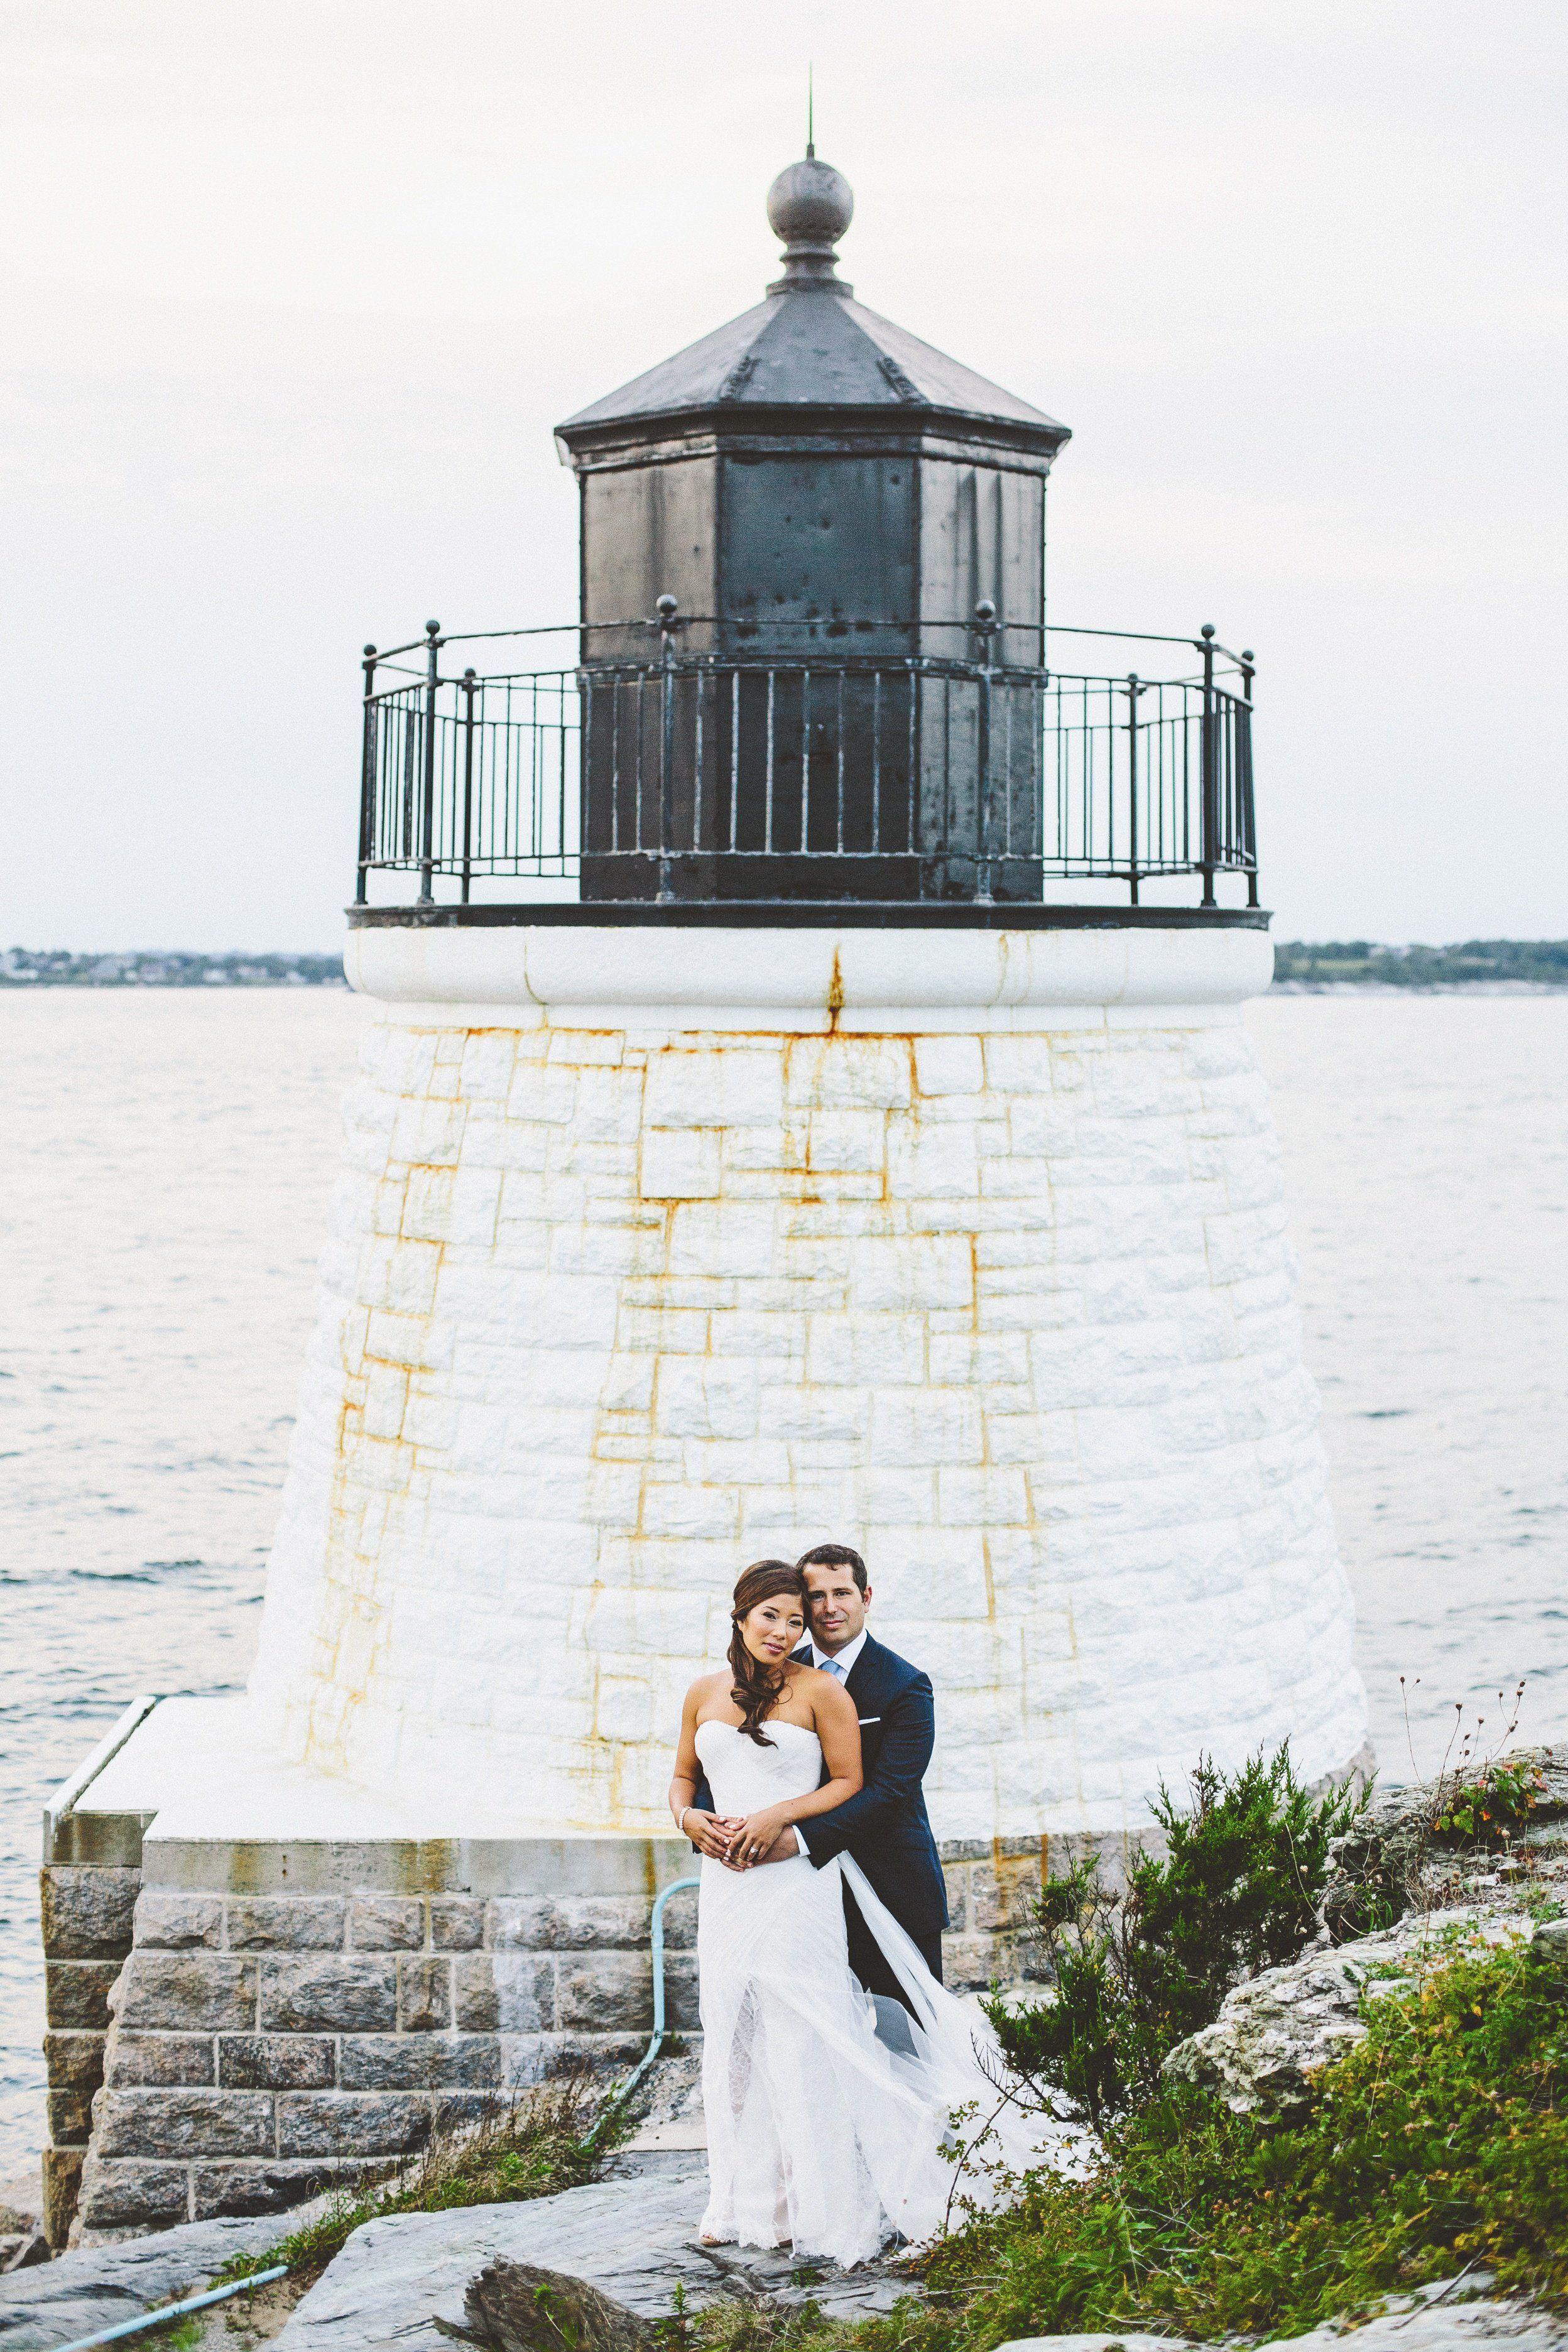 A Castle Hill Inn Wedding In Newport Rhode Island: Lighthouse Wedding Venue Ri At Reisefeber.org